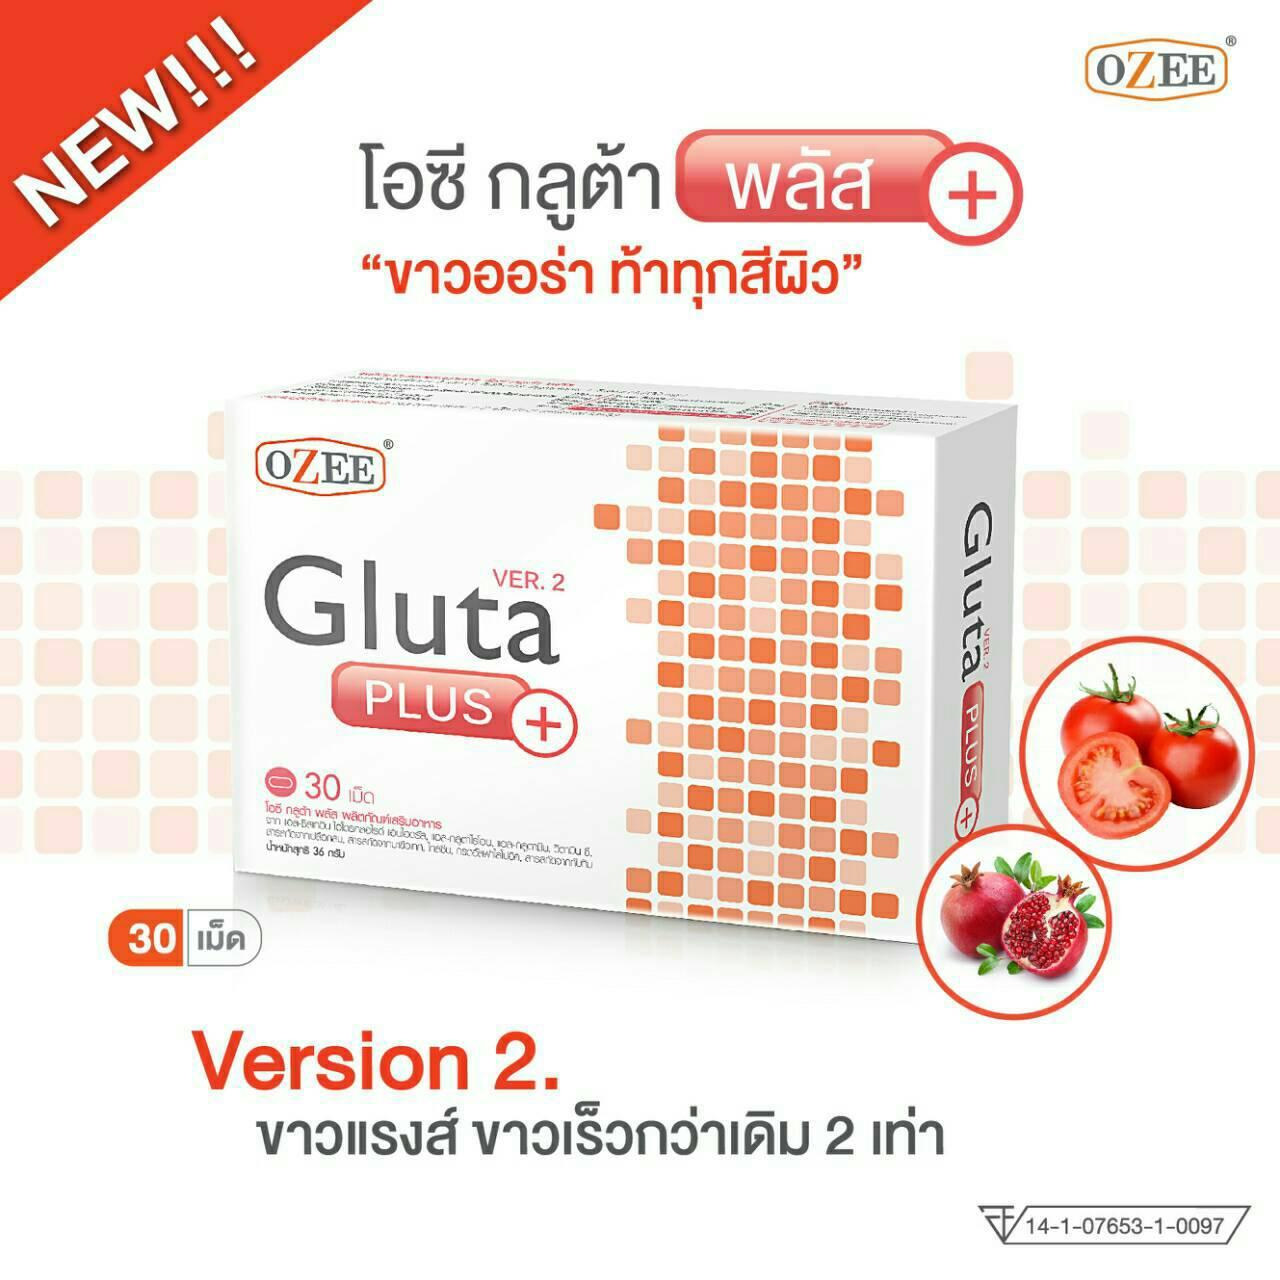 Ozee Gluta Plus